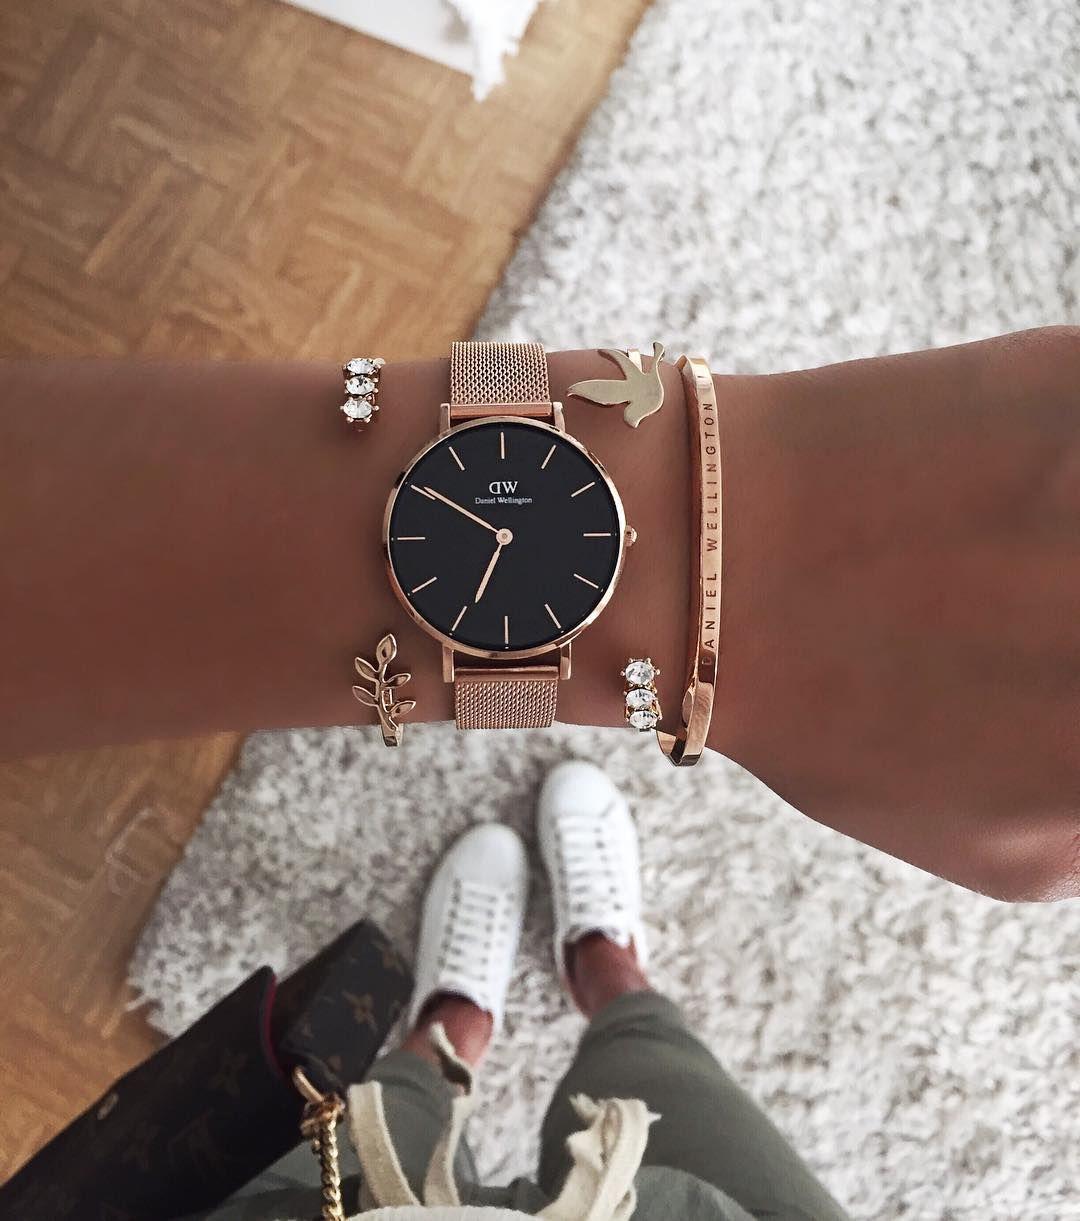 11 4 Mil Curtidas 62 Comentarios Thanya Thanyaw No Instagram Ihr Lieben Ab Heute Gib Modische Armbanduhren Frauen Accessoires Daniel Wellington Uhr